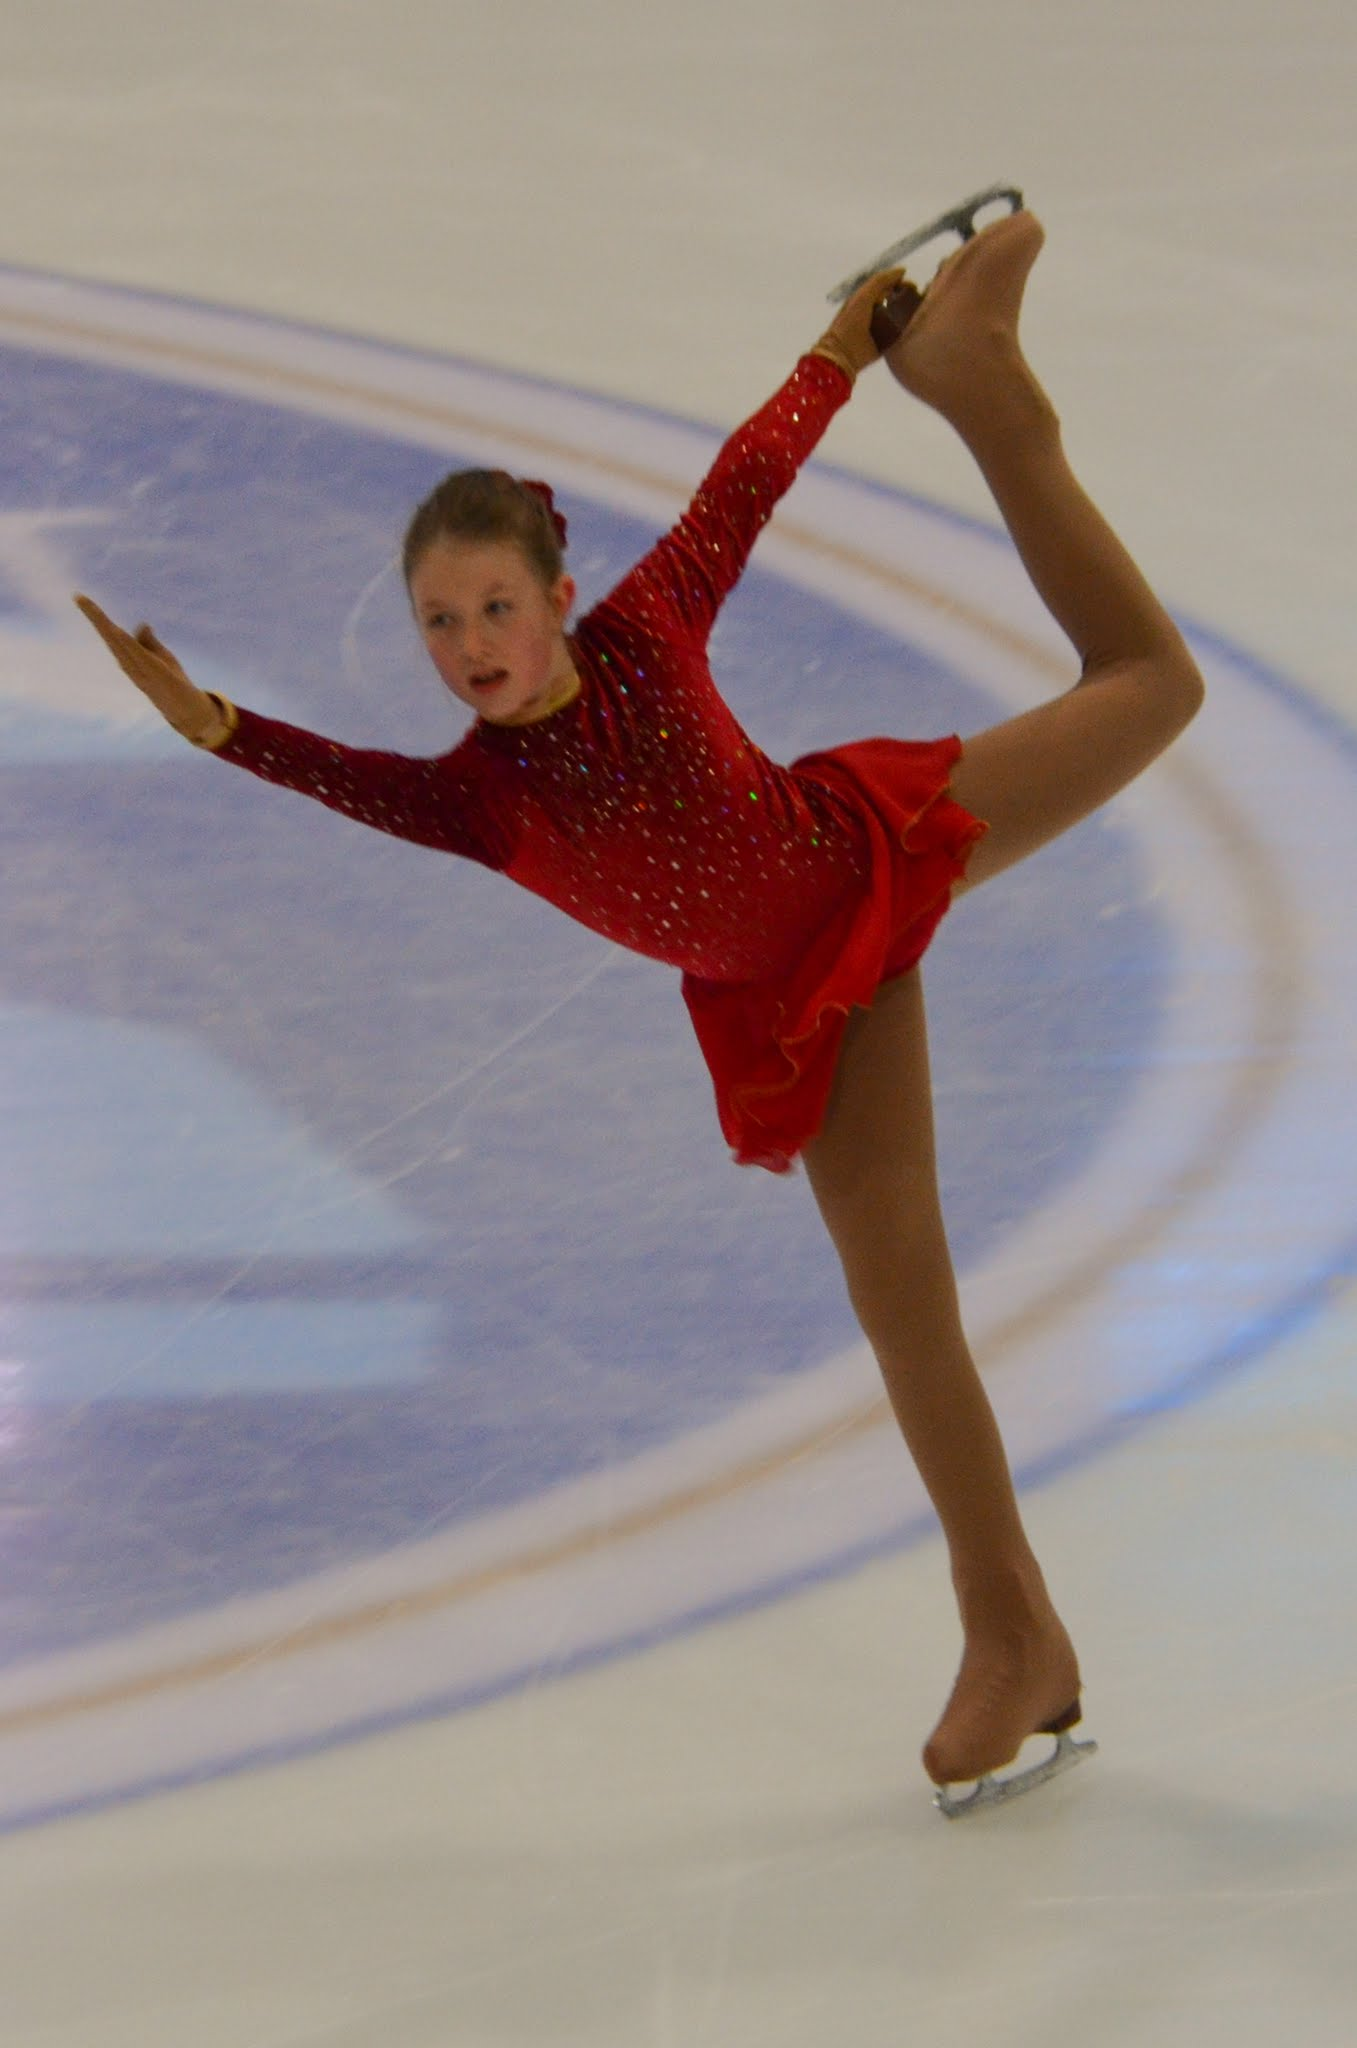 Flavia Holtbecker